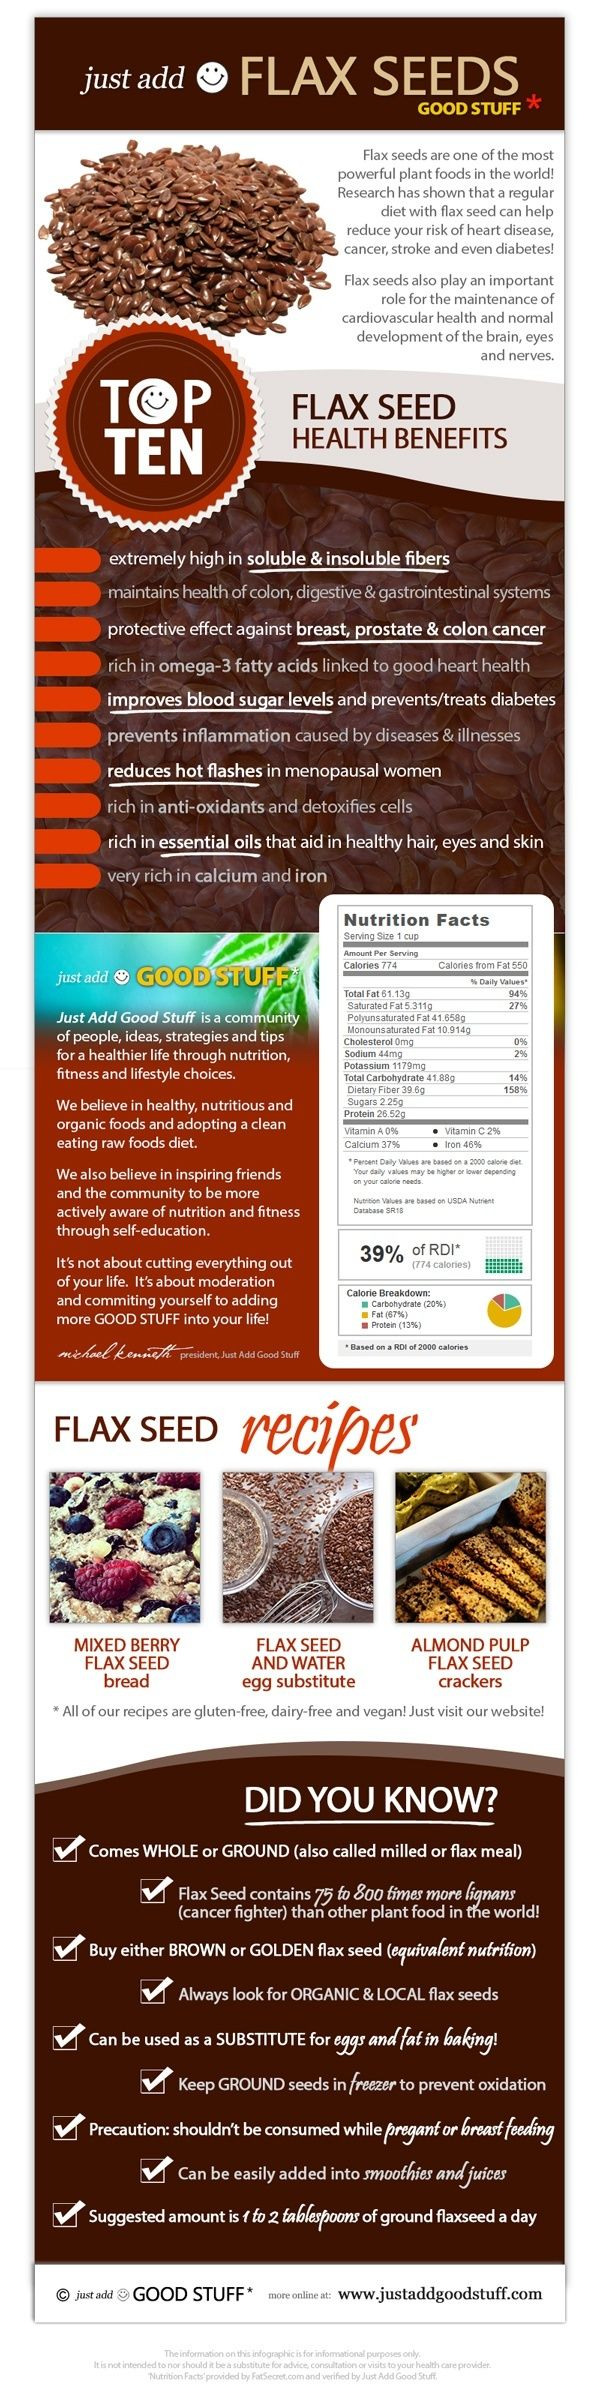 Top 10 Flax Seeds Health Benefits...